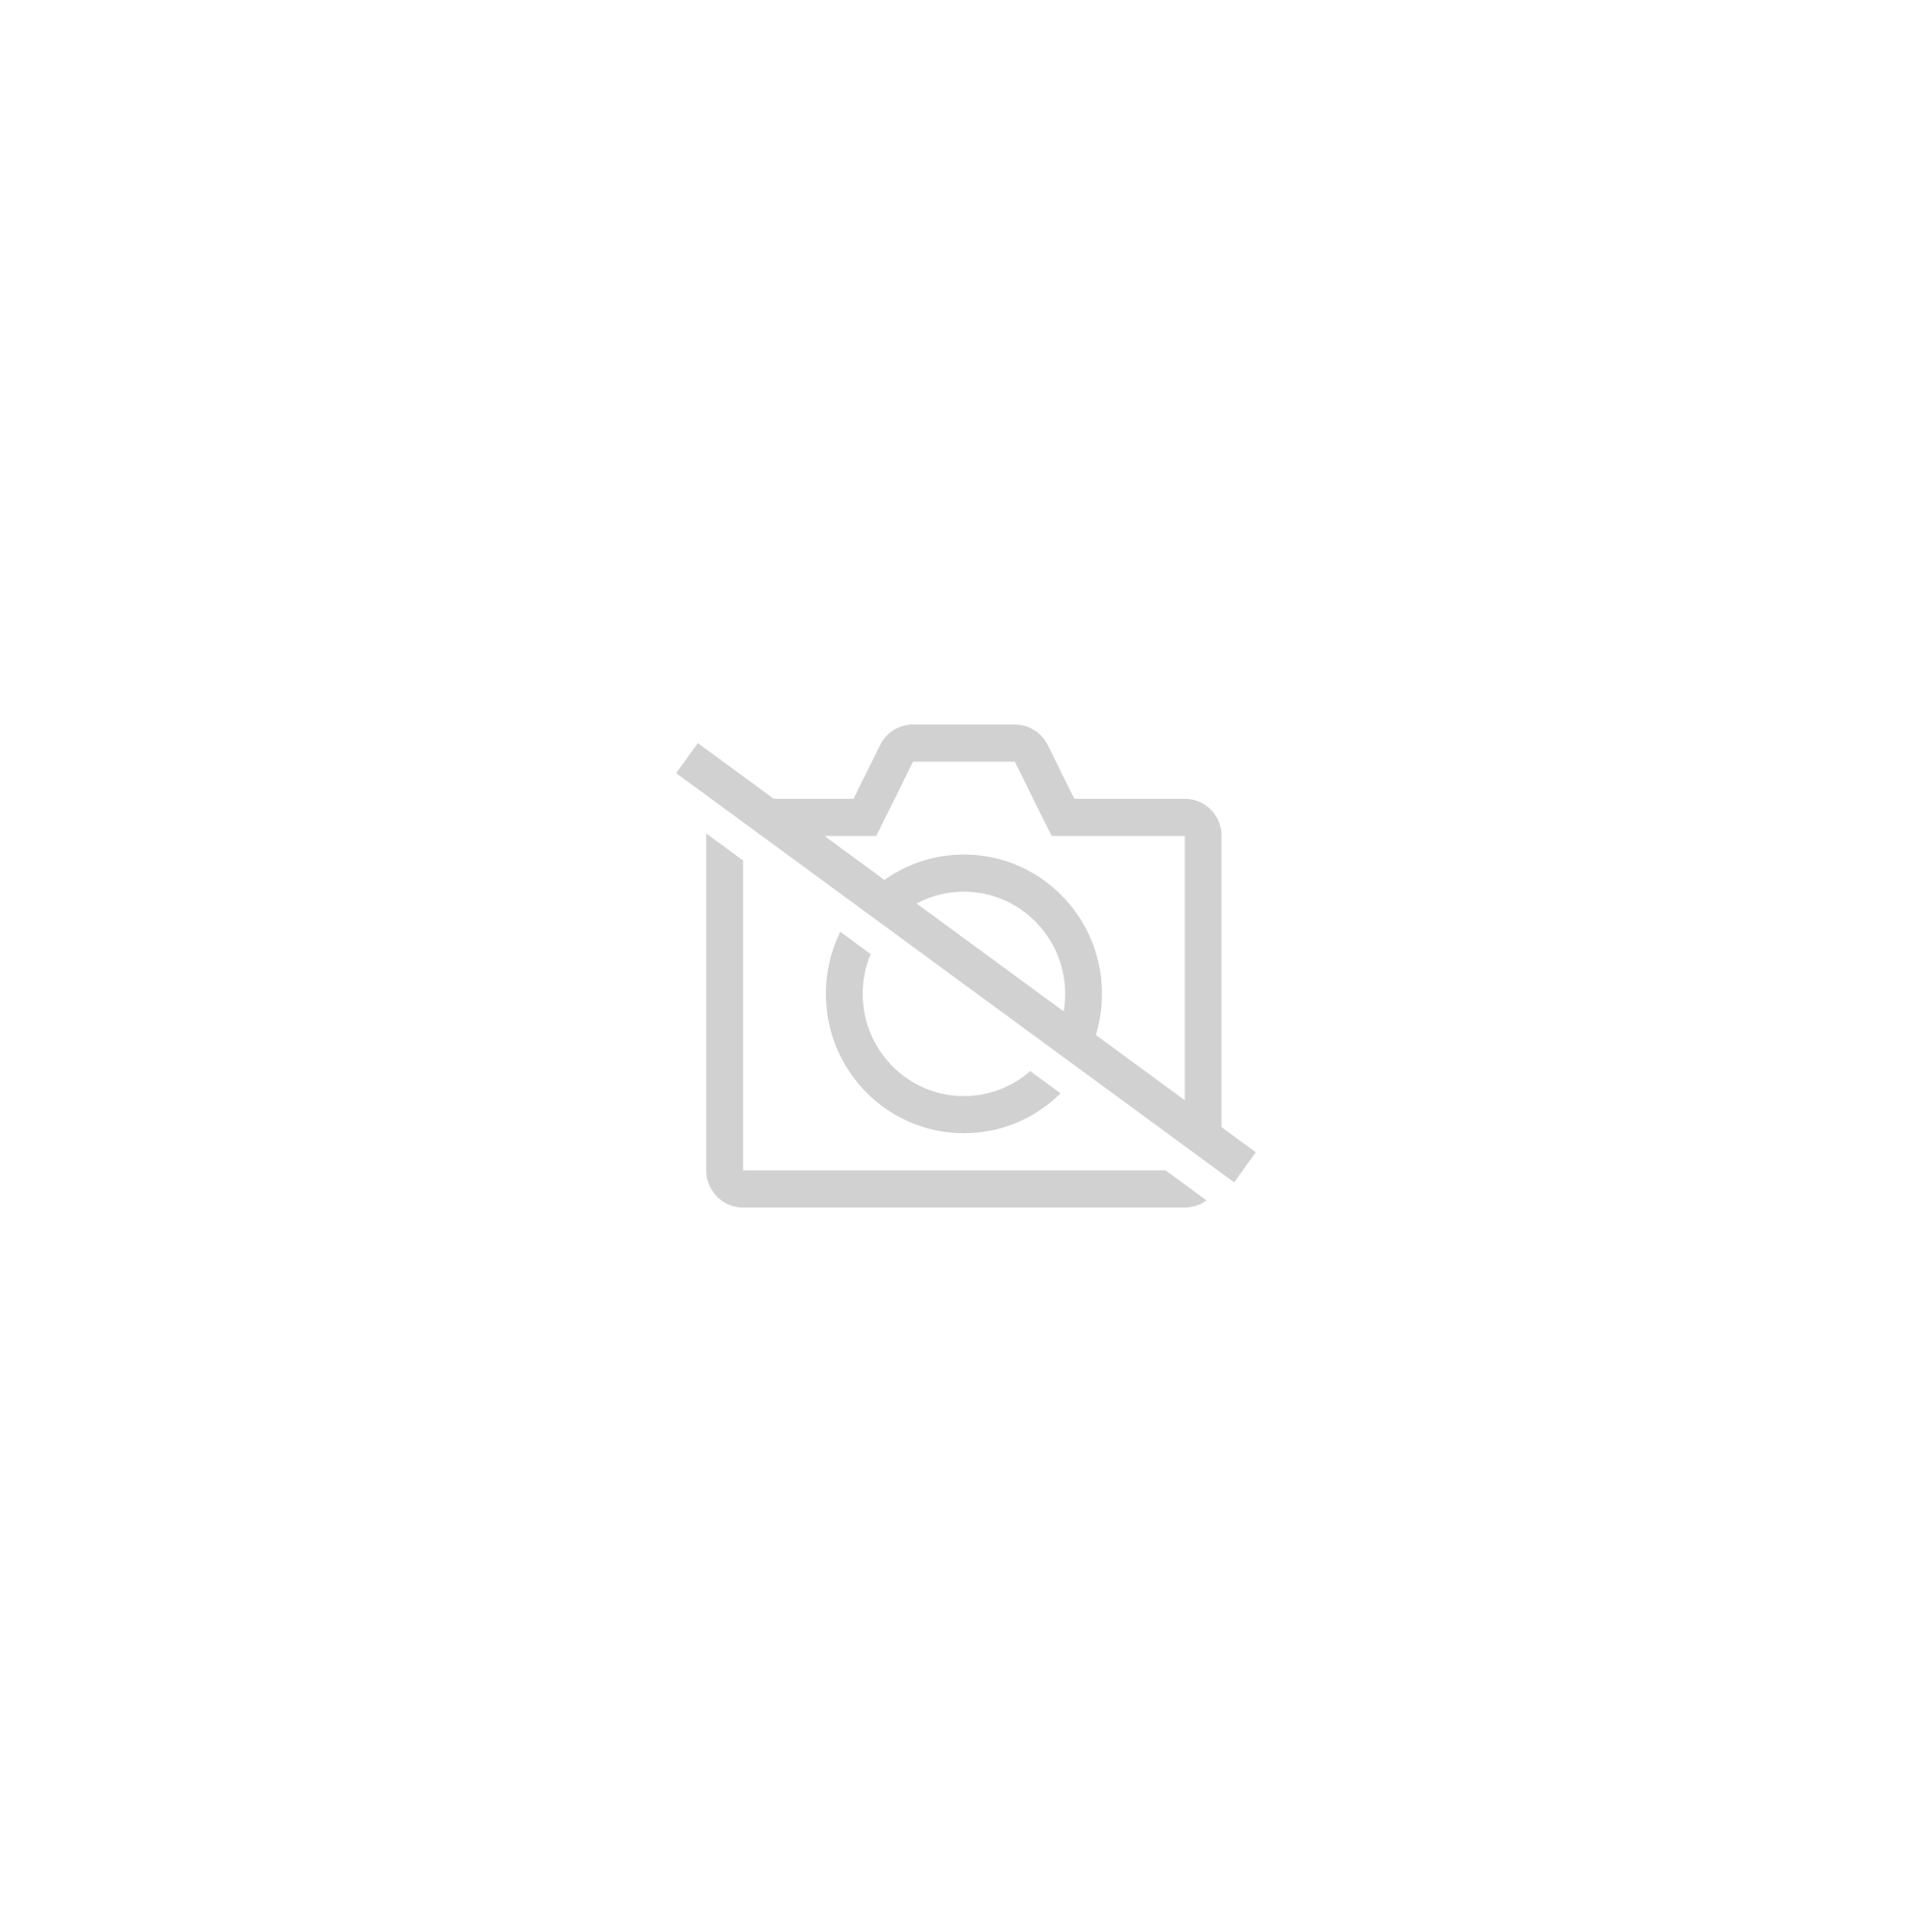 - Fabrication fran/çaise Bleu Canard Enfant//Adulte Etui sant/é